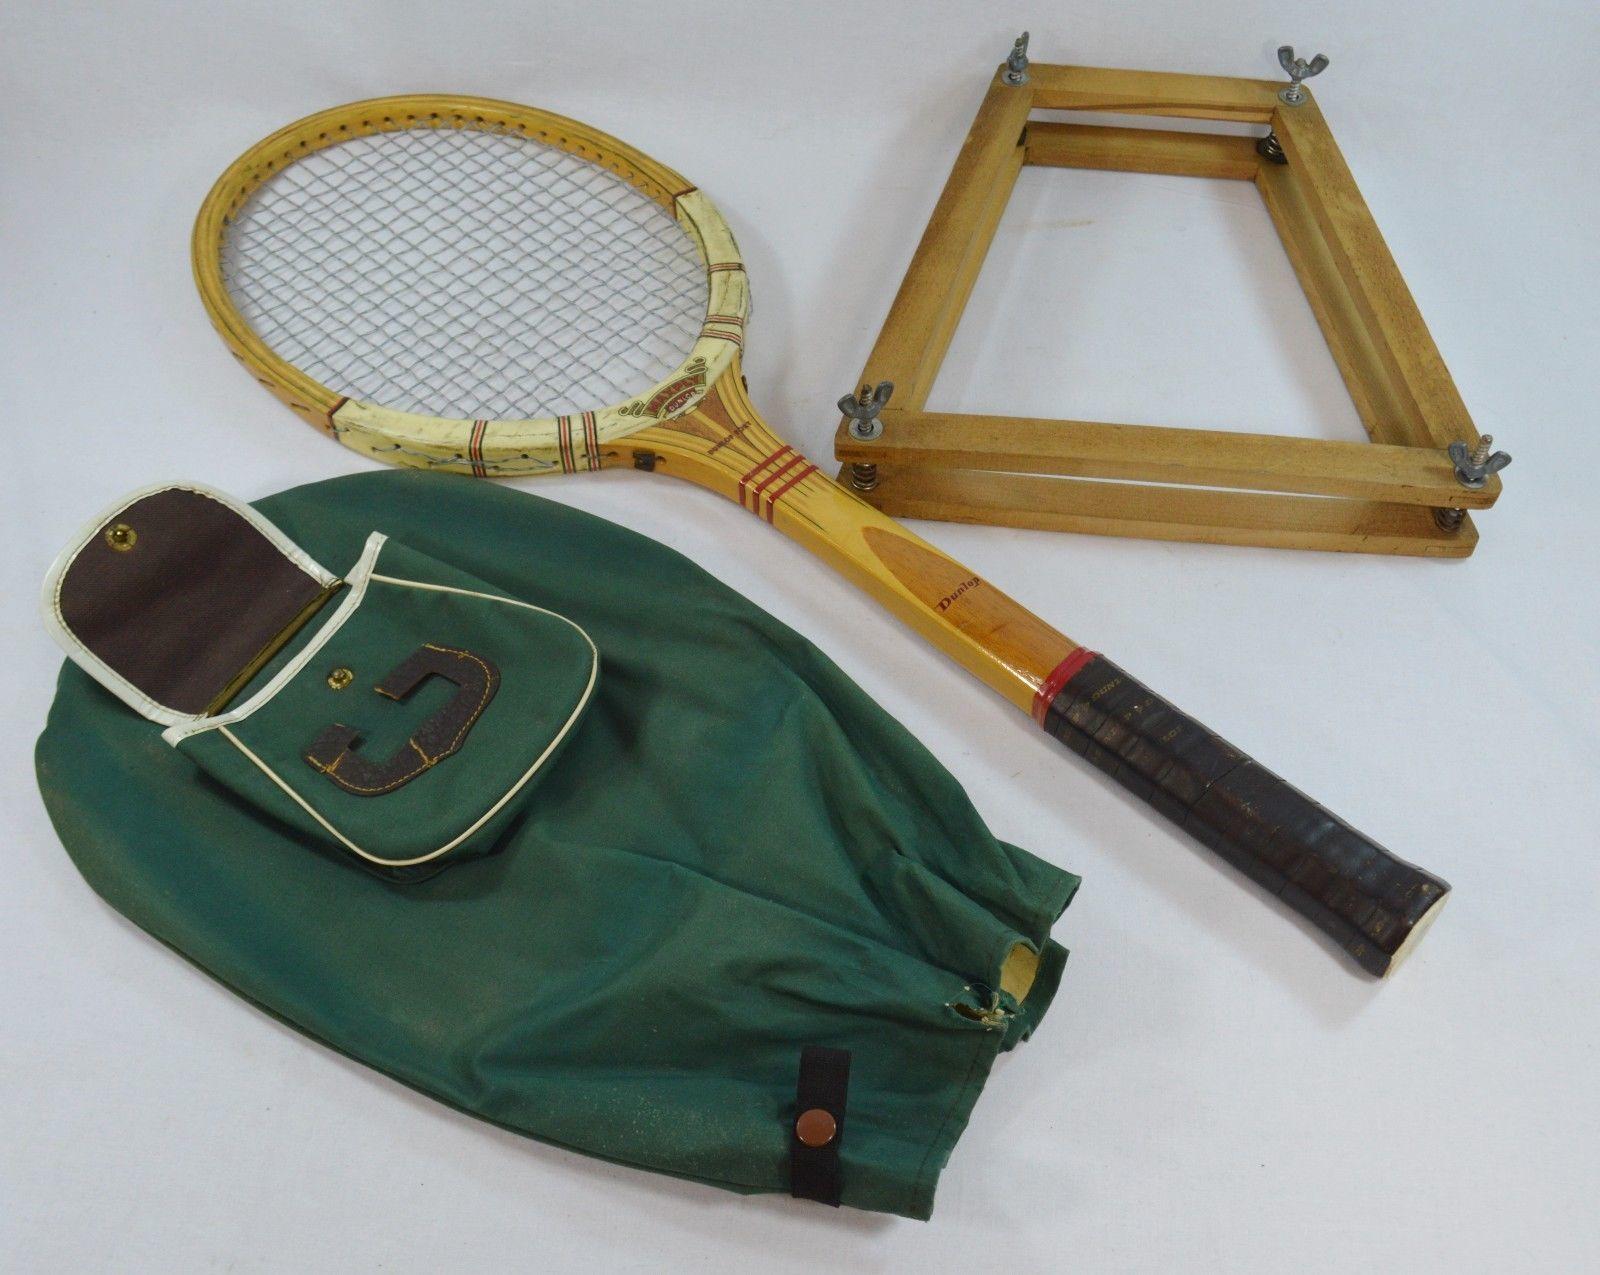 Vintage Dunlop Maxply Fort Tennis Racket and 50 similar items b70638e522a3a